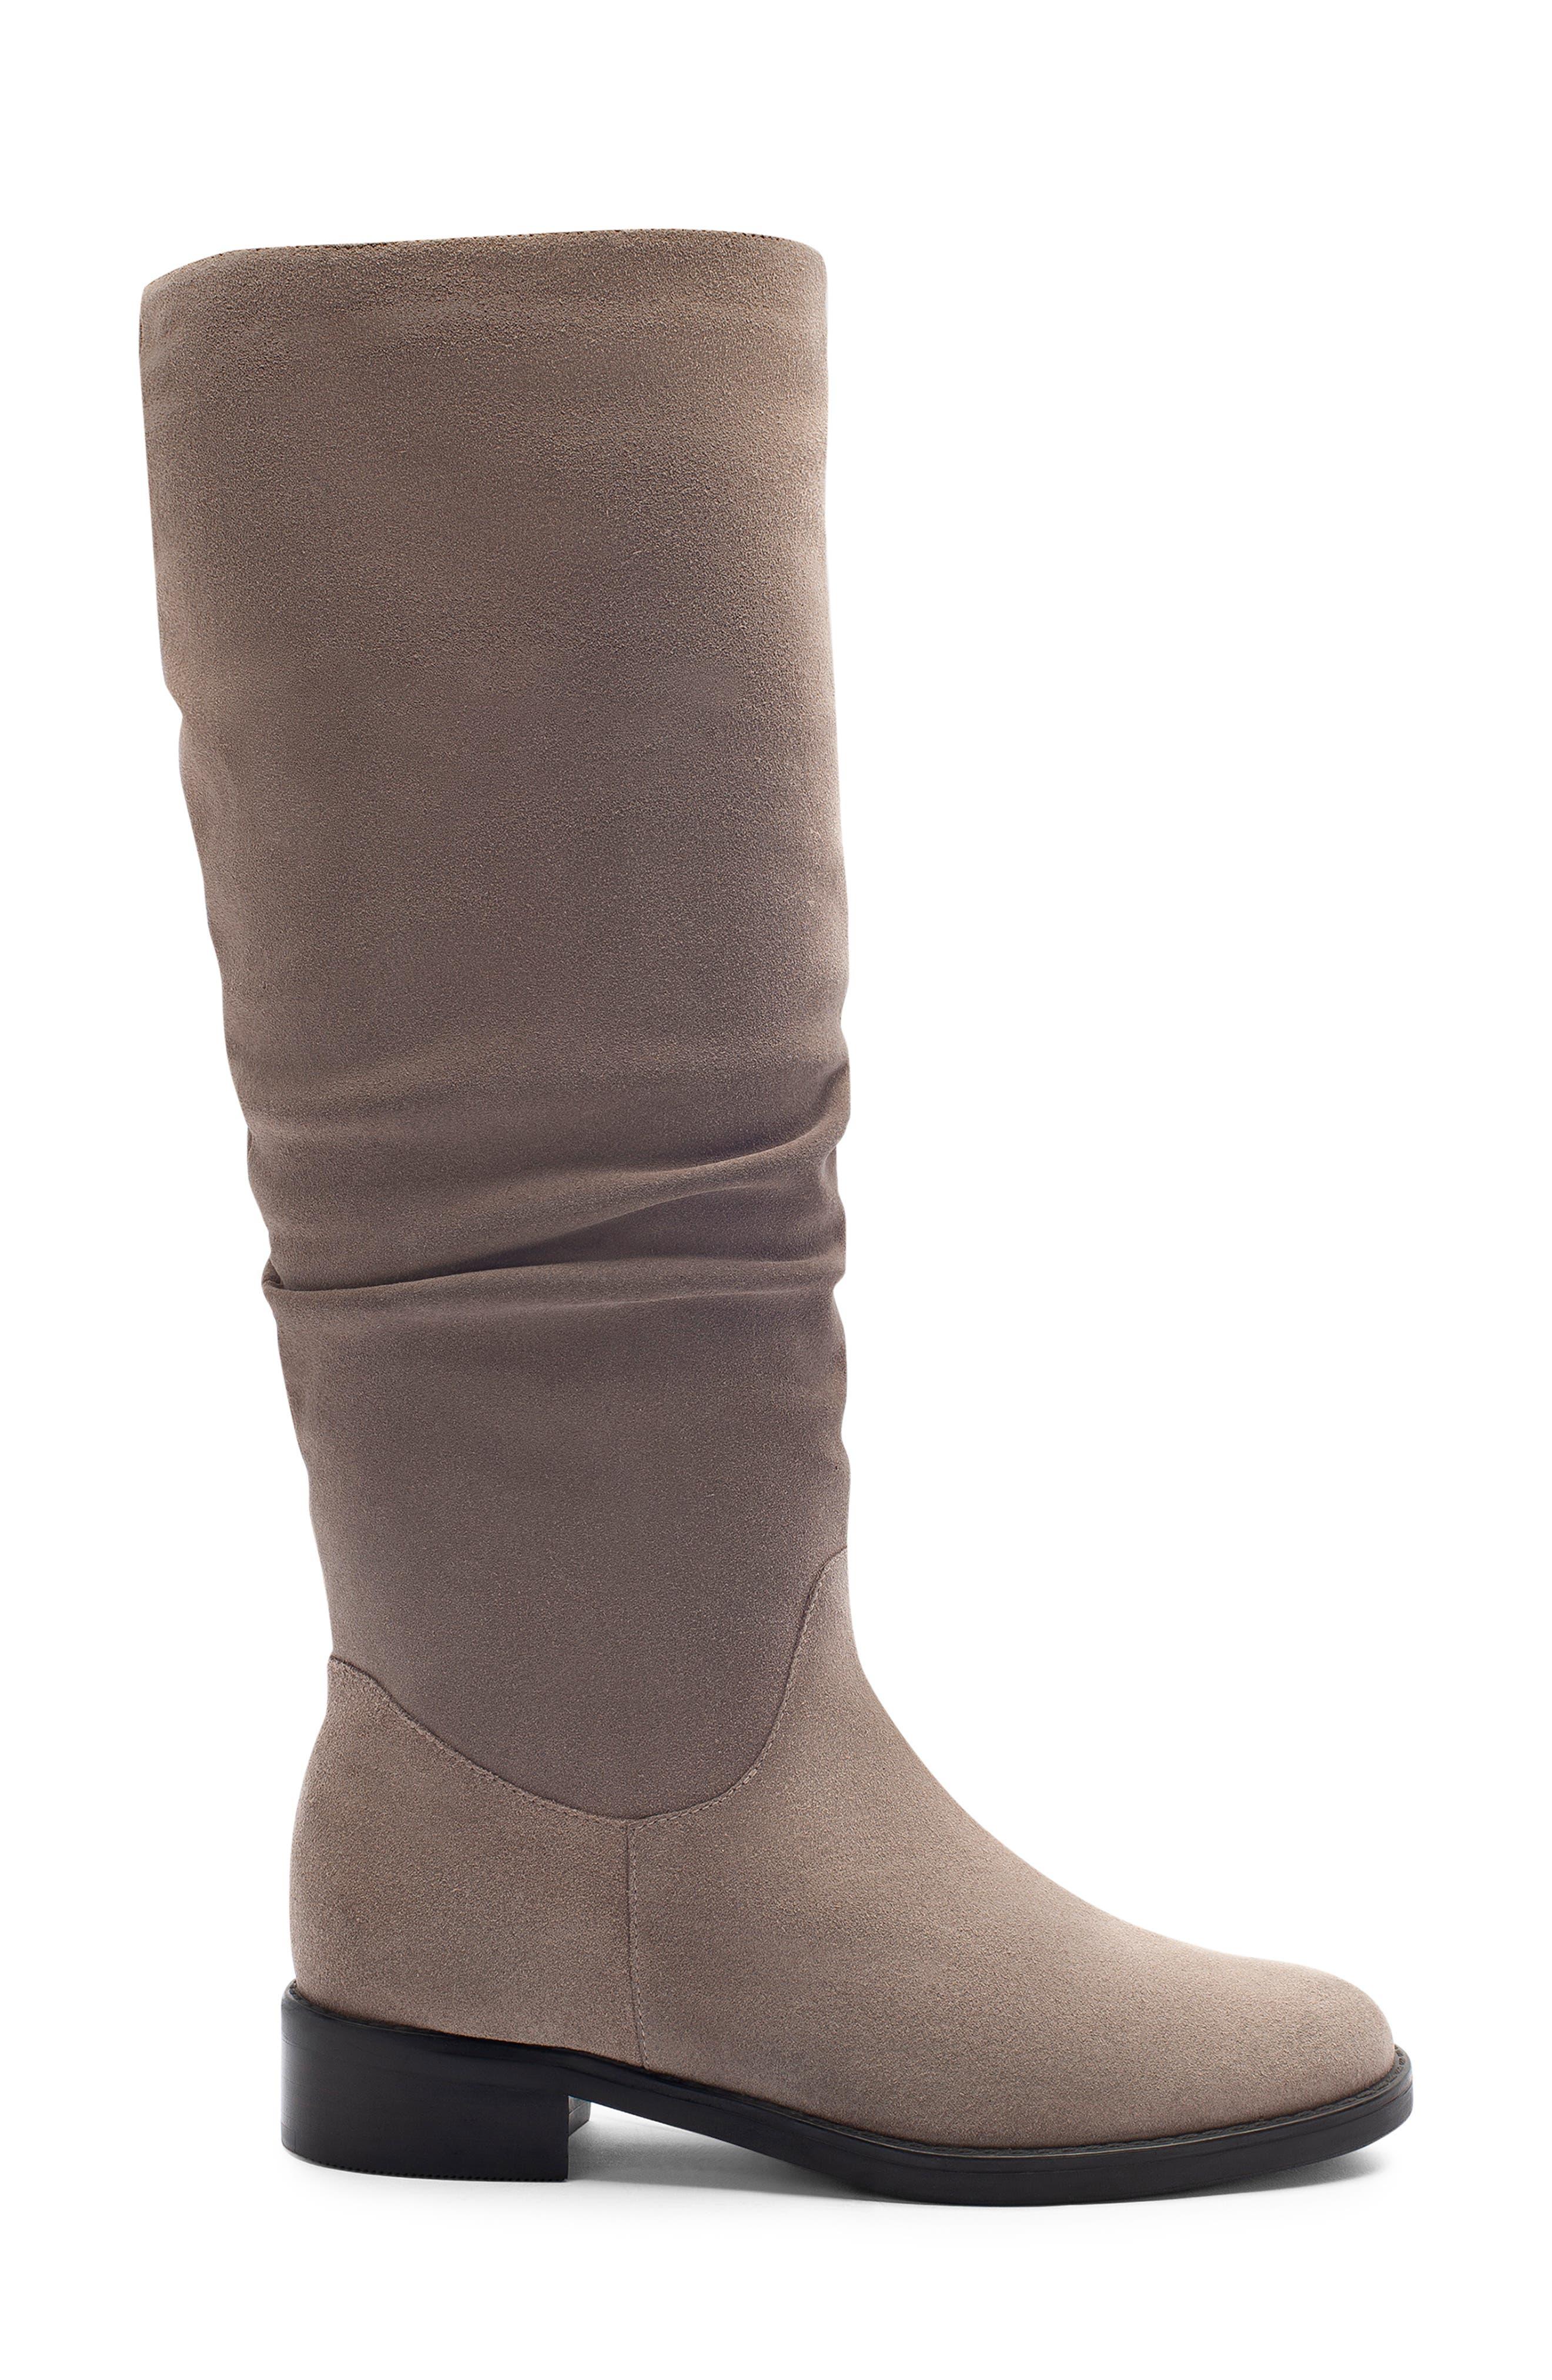 BLONDO, Erika Waterproof Knee High Boot, Alternate thumbnail 3, color, DARK TAUPE SUEDE